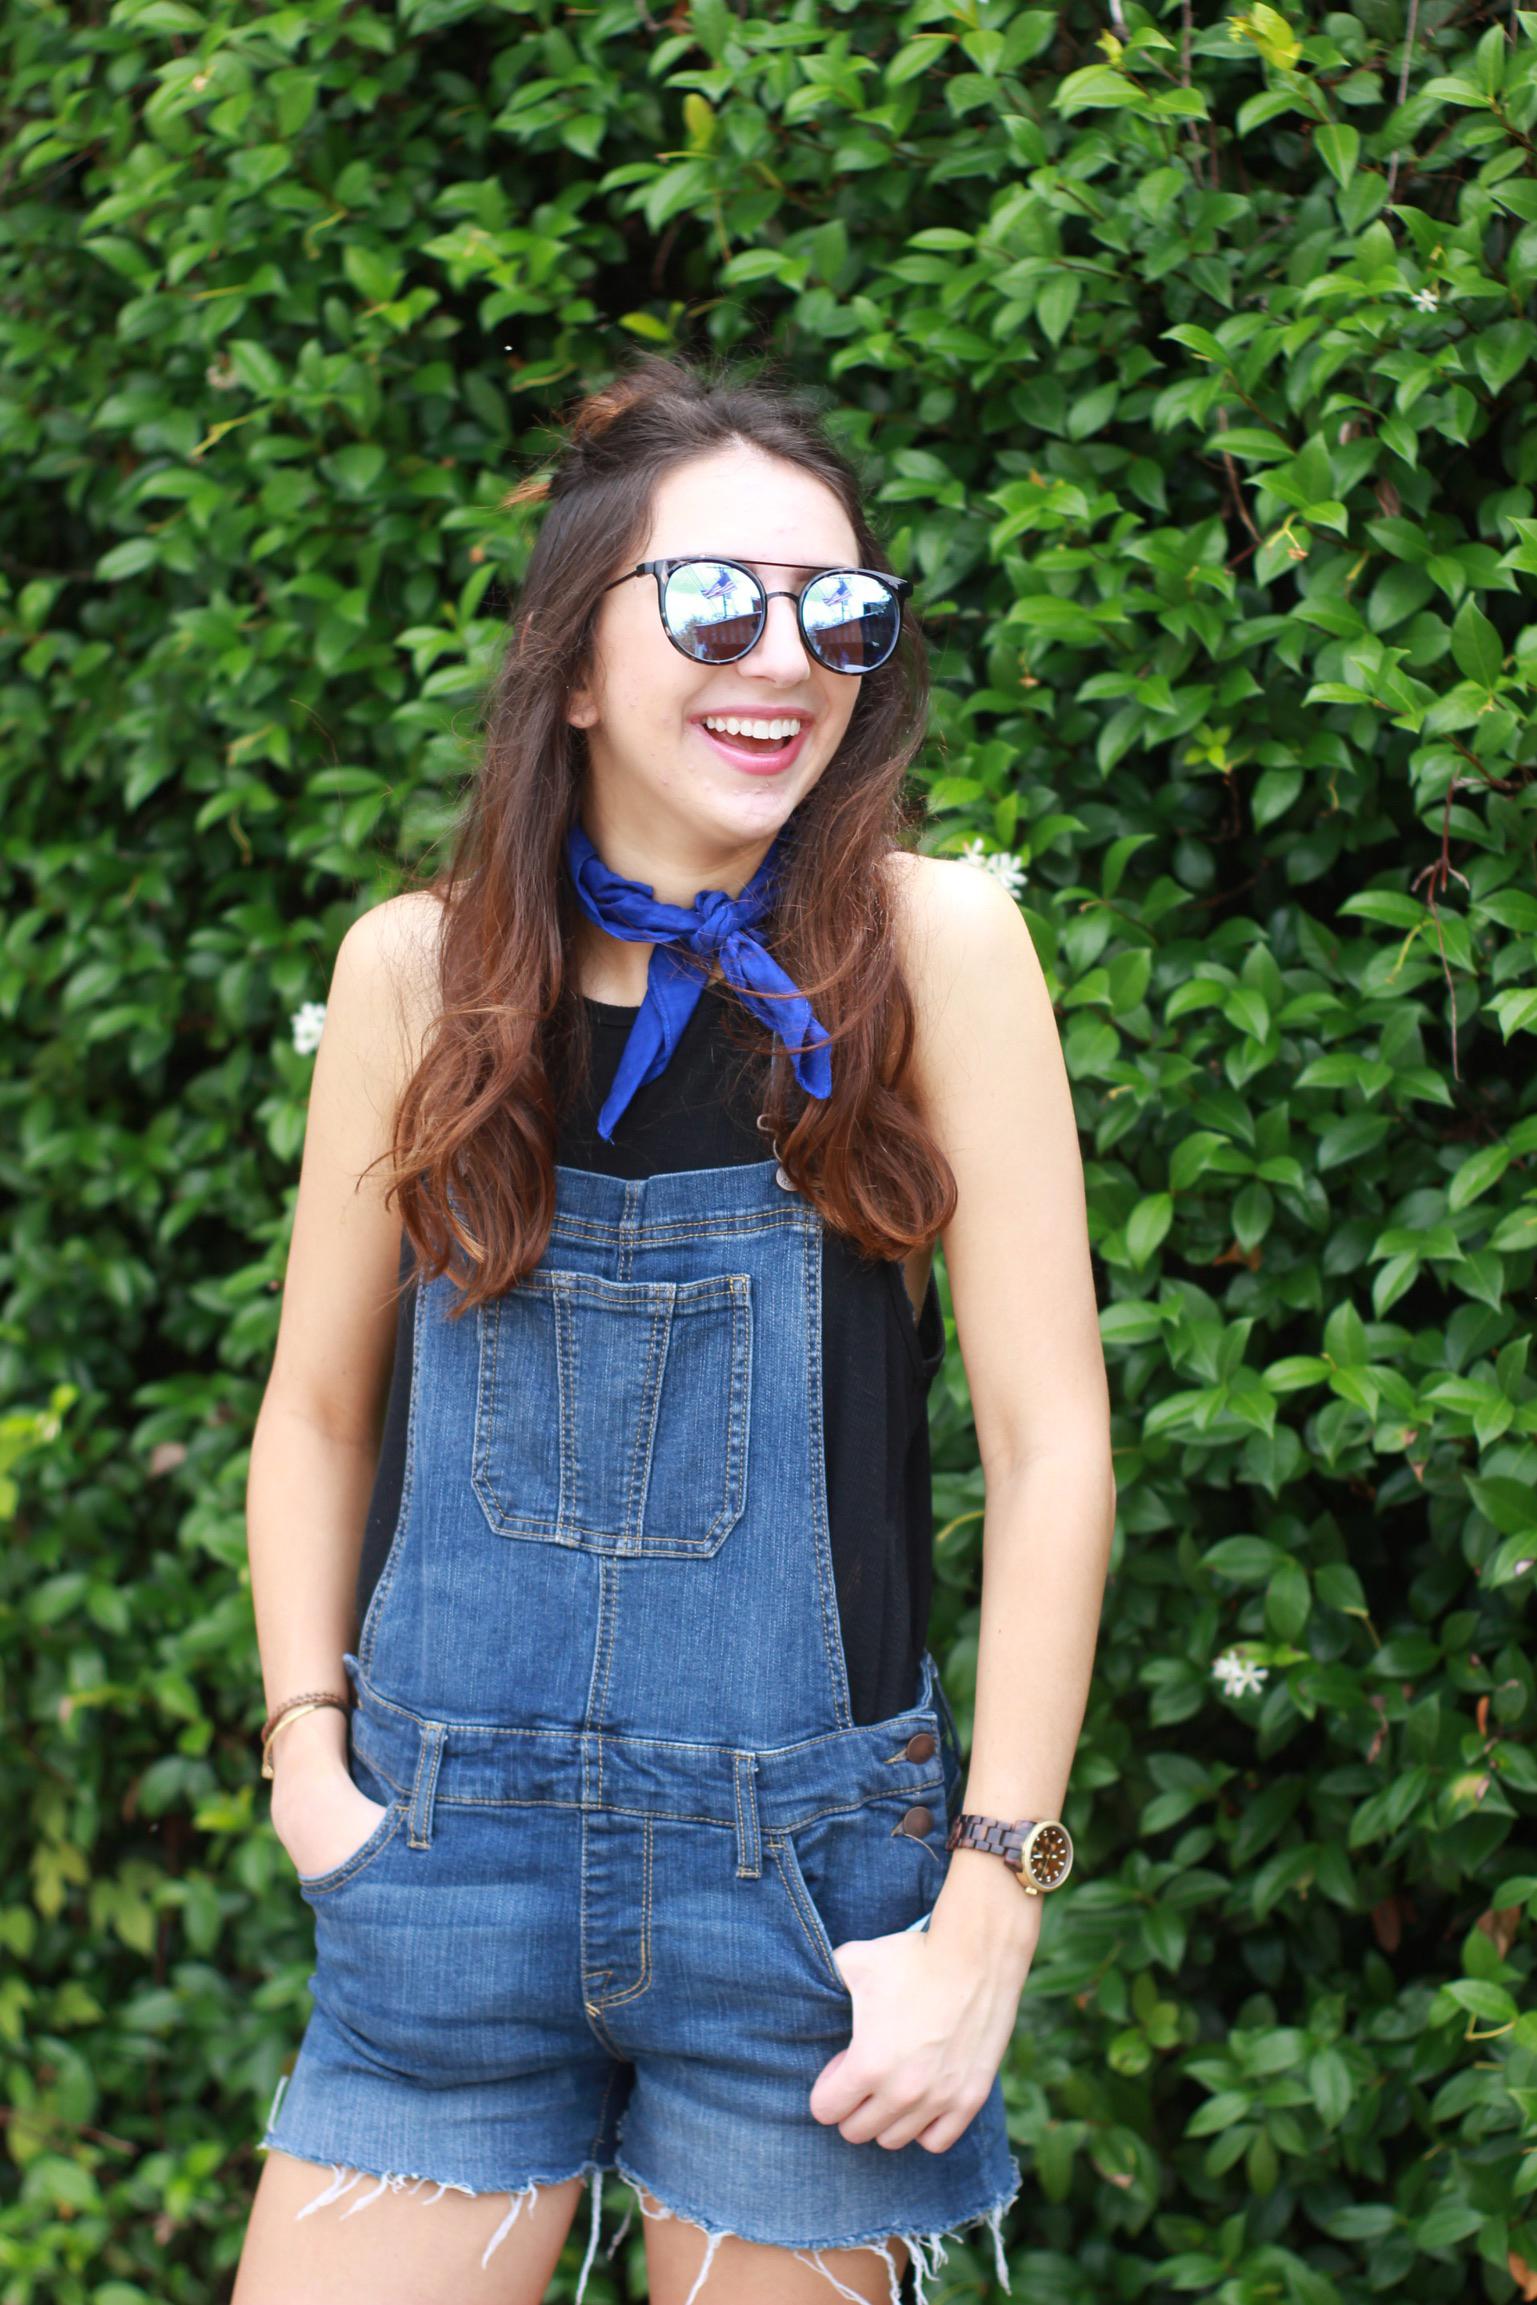 styling-overalls-4-lgip